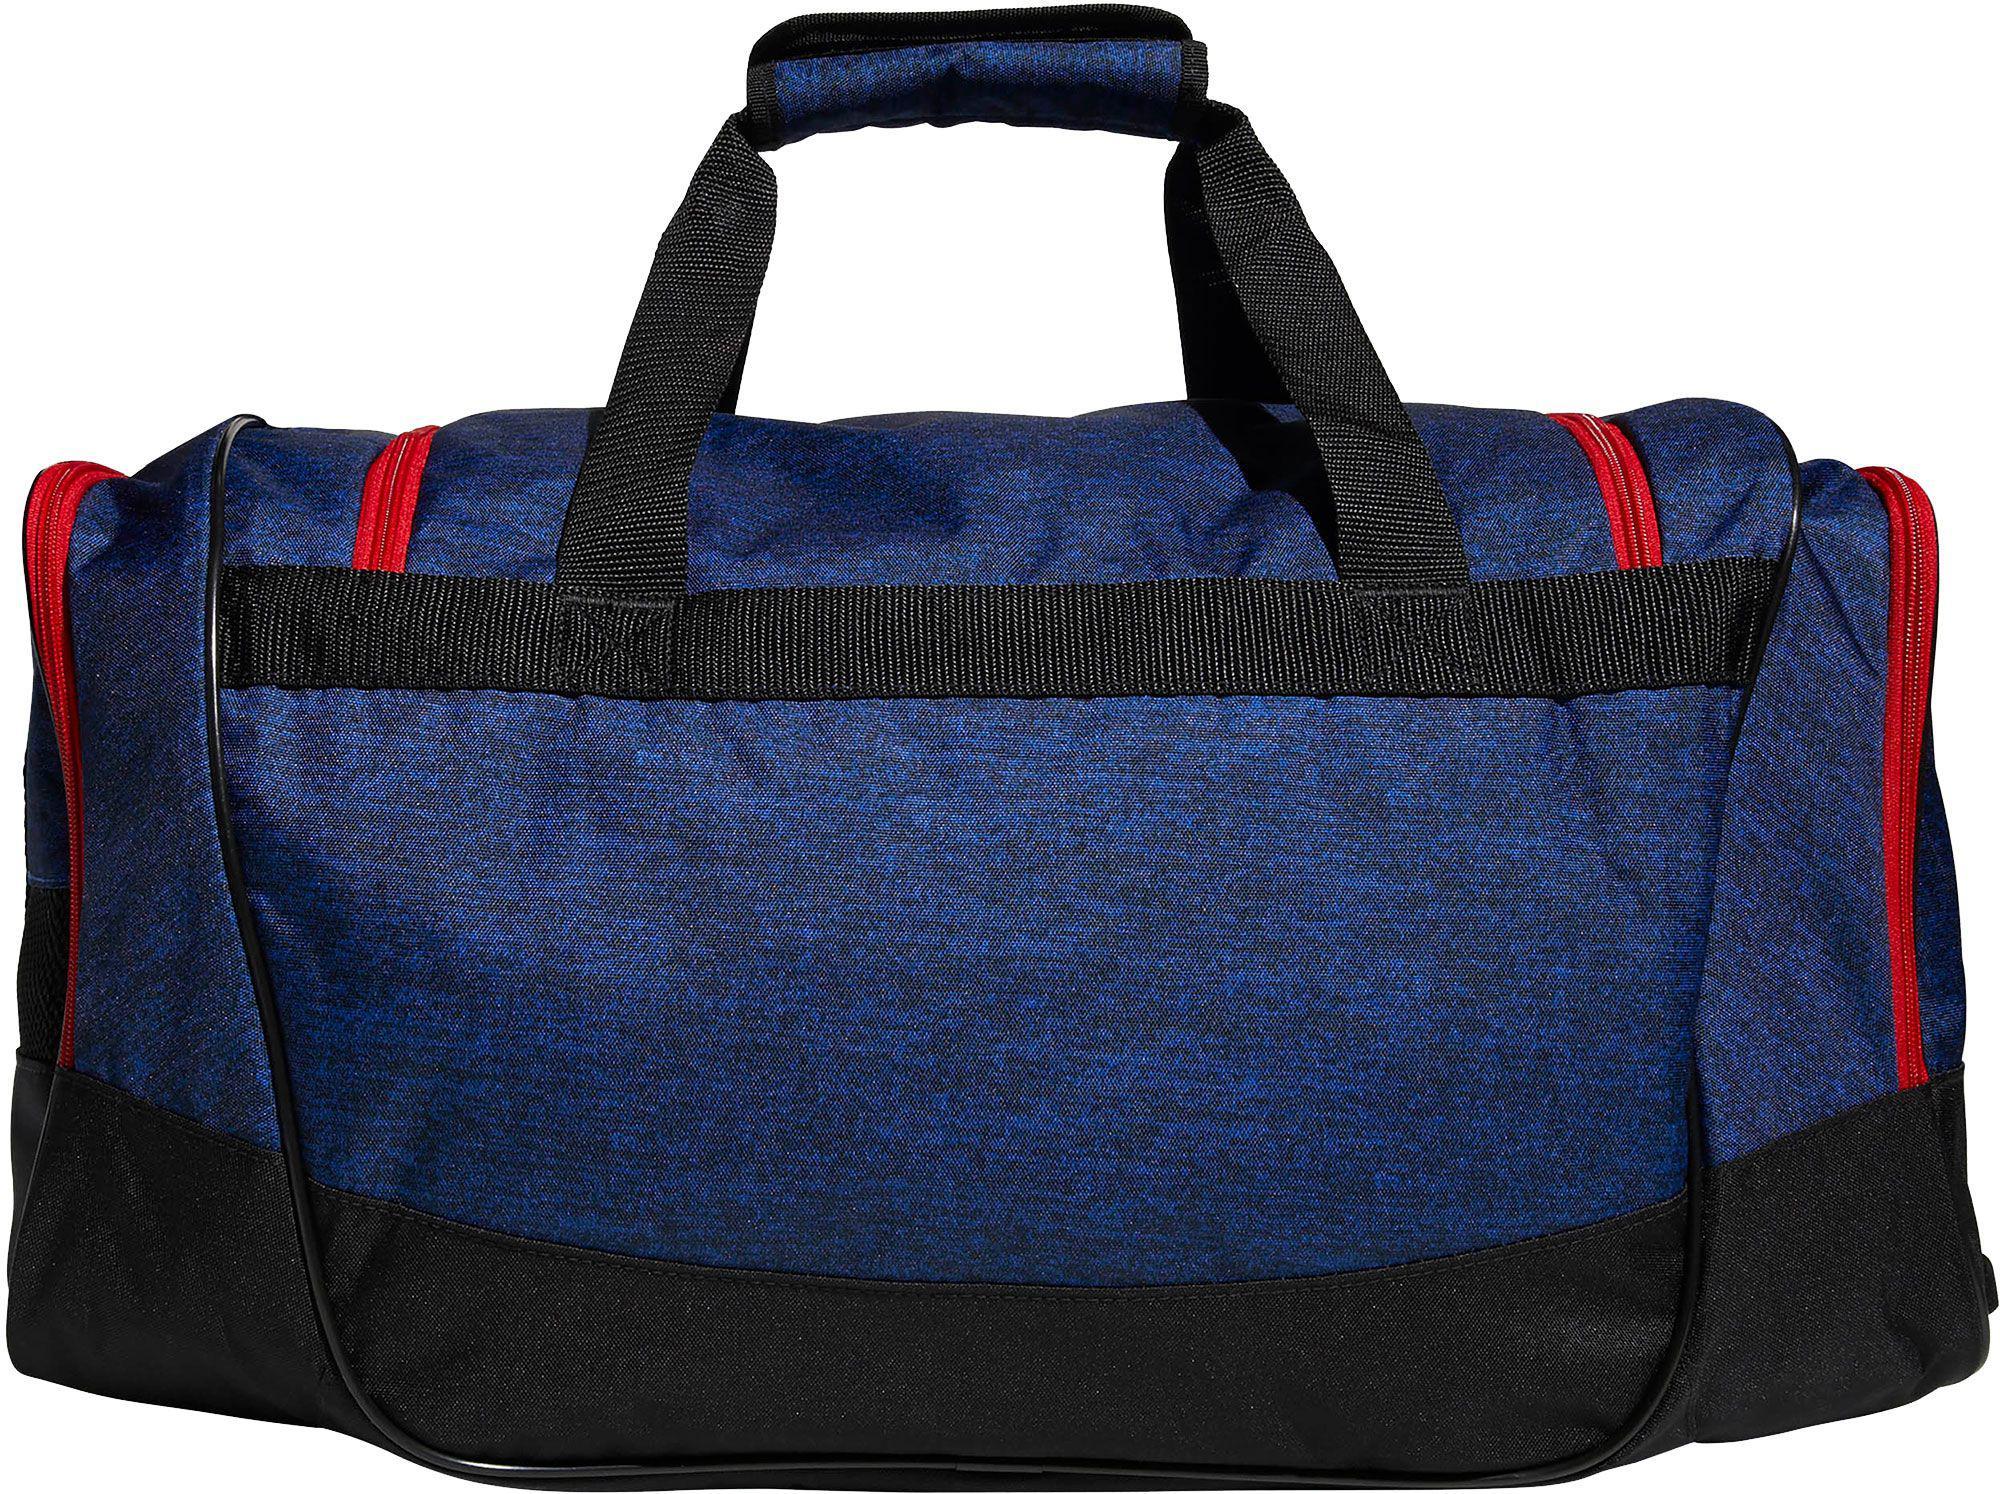 Adidas Blue Defender Iii Medium Duffle Bag For Men Lyst View Fullscreen